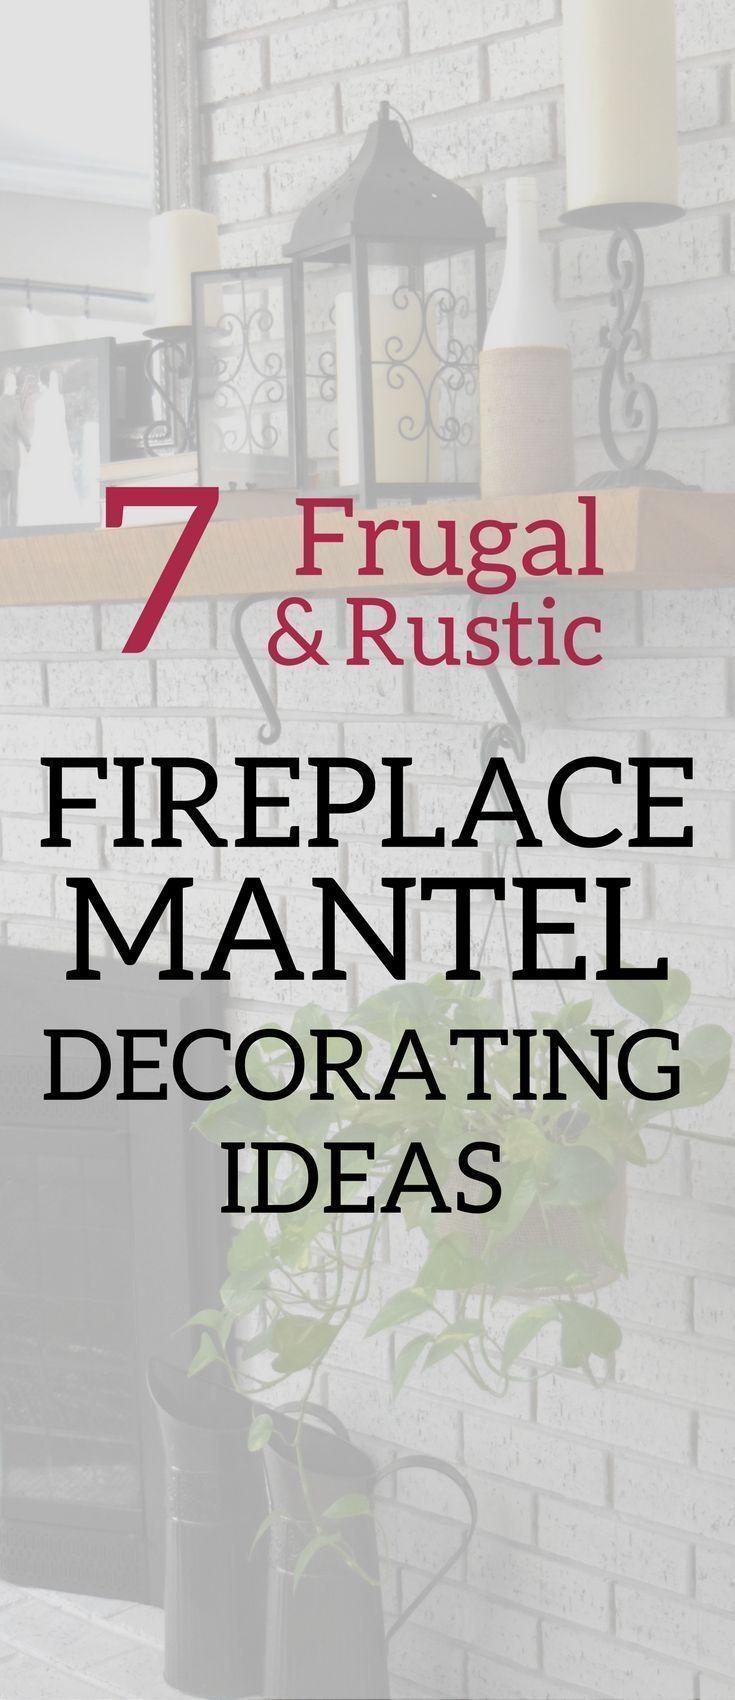 A Brick Home: Fireplace mantel decorating ideas, everyday mantel ...